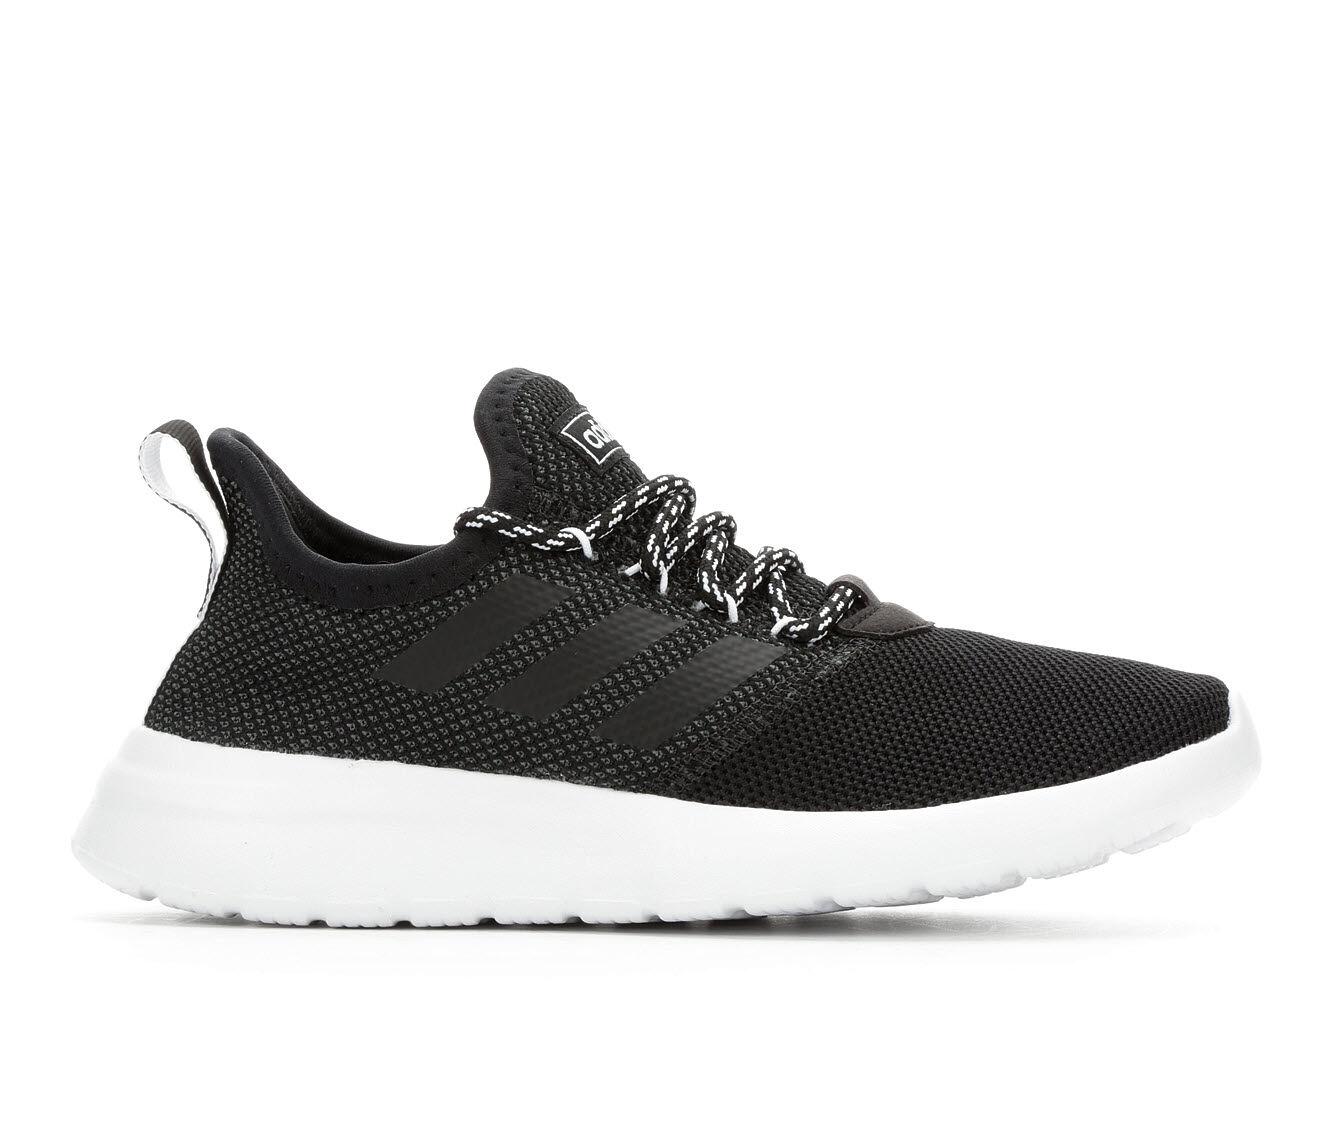 Women's Adidas Lite Racer Reborn Sneakers Black/Grey/Wht